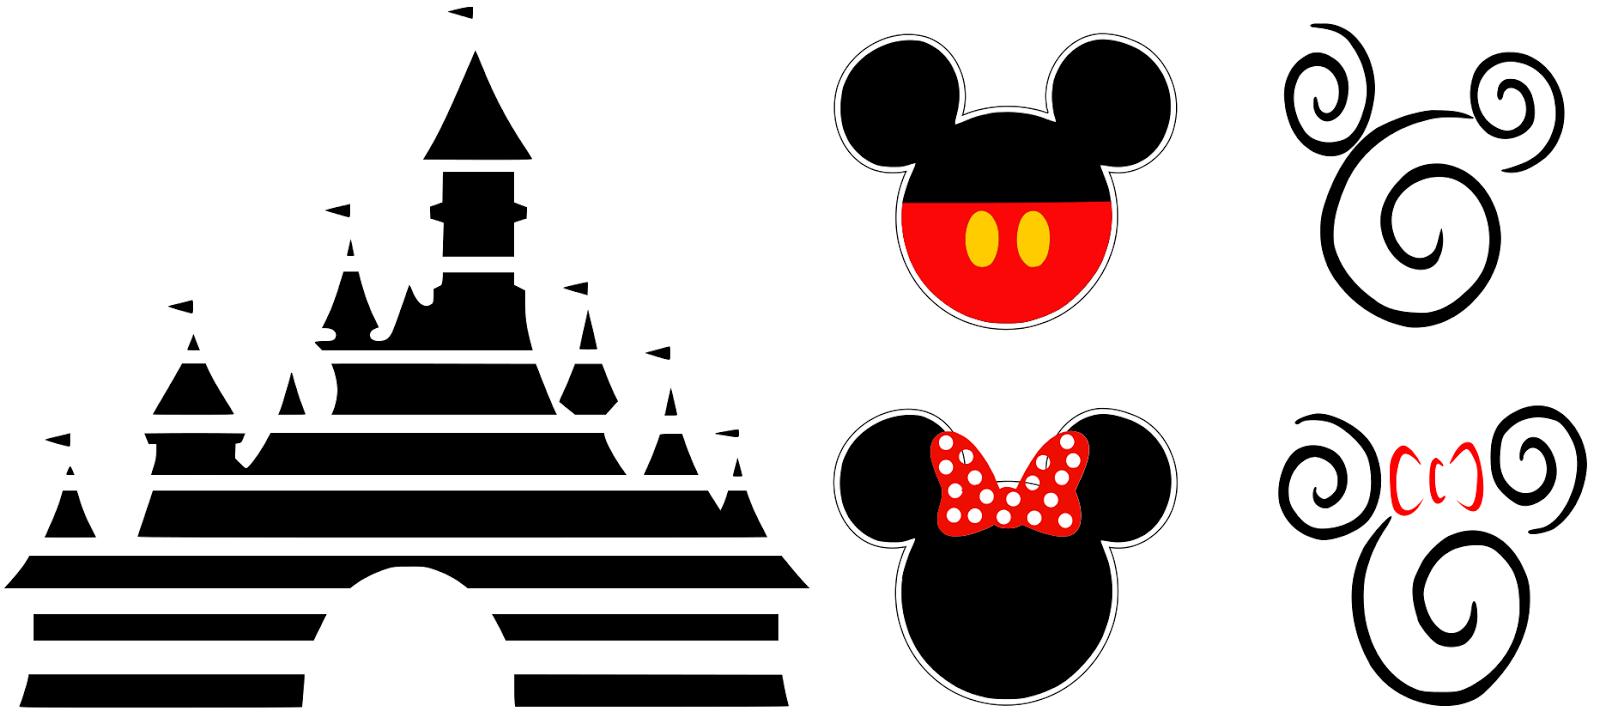 Disney svg #7, Download drawings